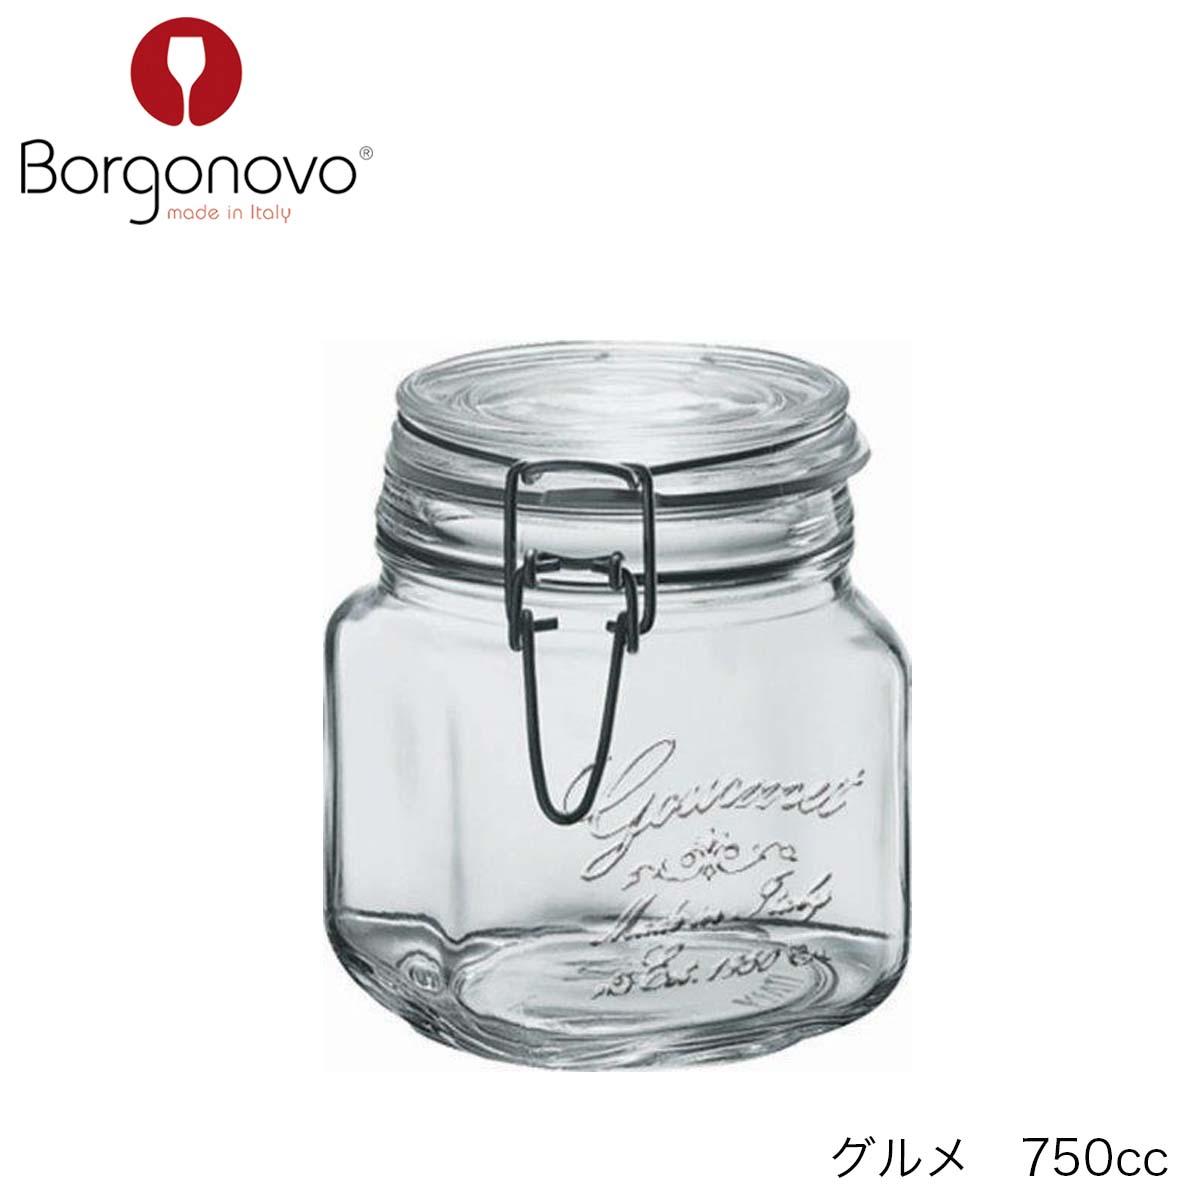 Borgonovo ボルゴノーヴォ グルメ 750 750ml イタリア製 10個セット